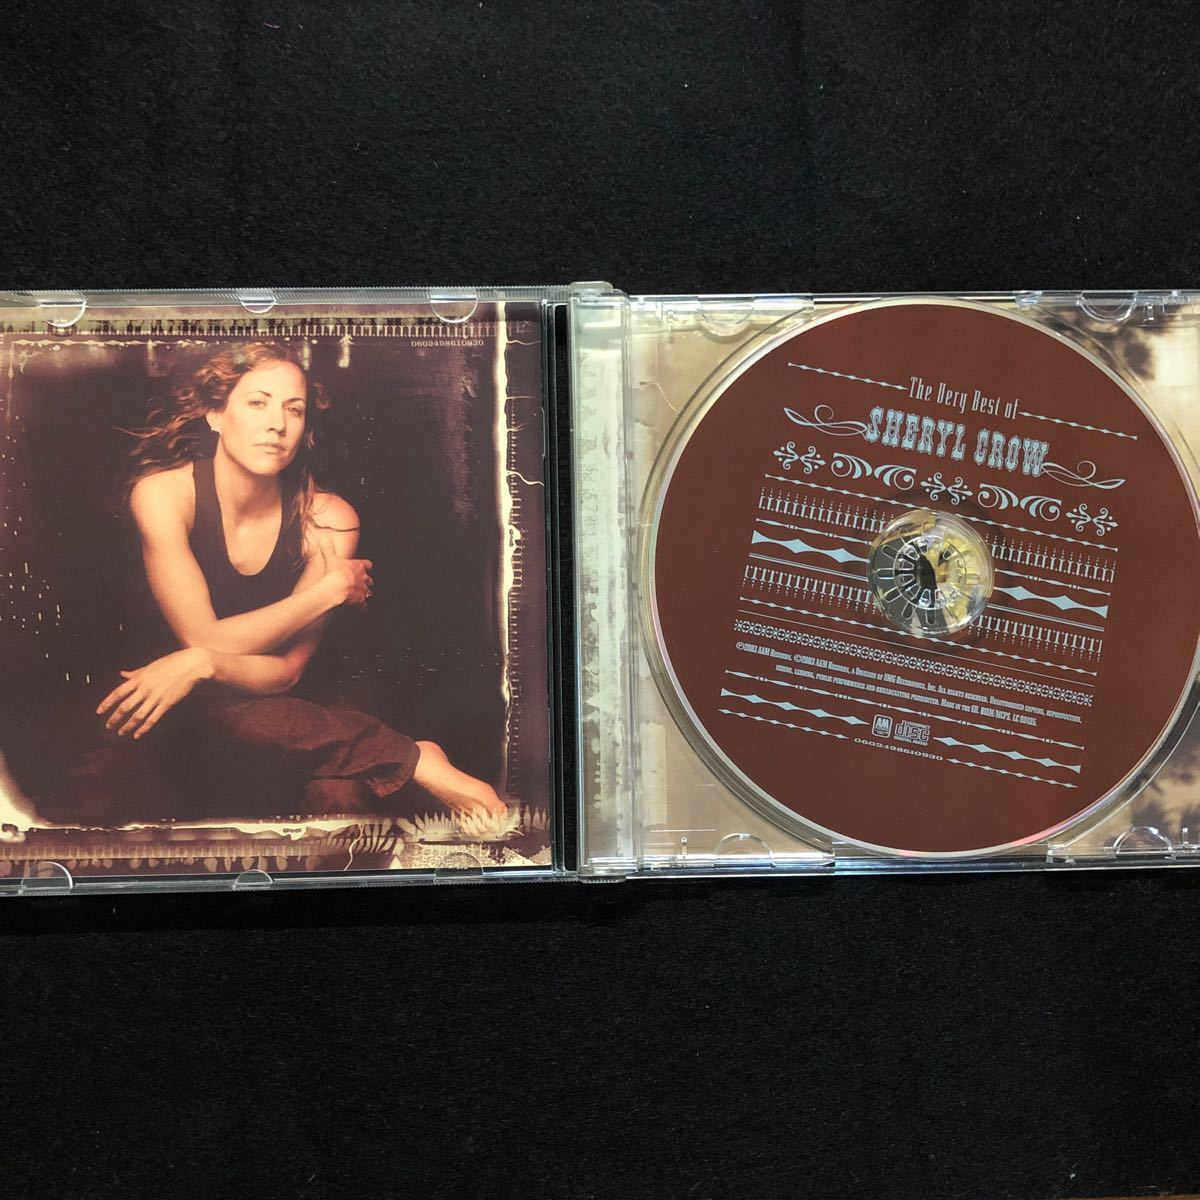 輸入盤 SHERYL CROW / VERY BEST OF [CD]